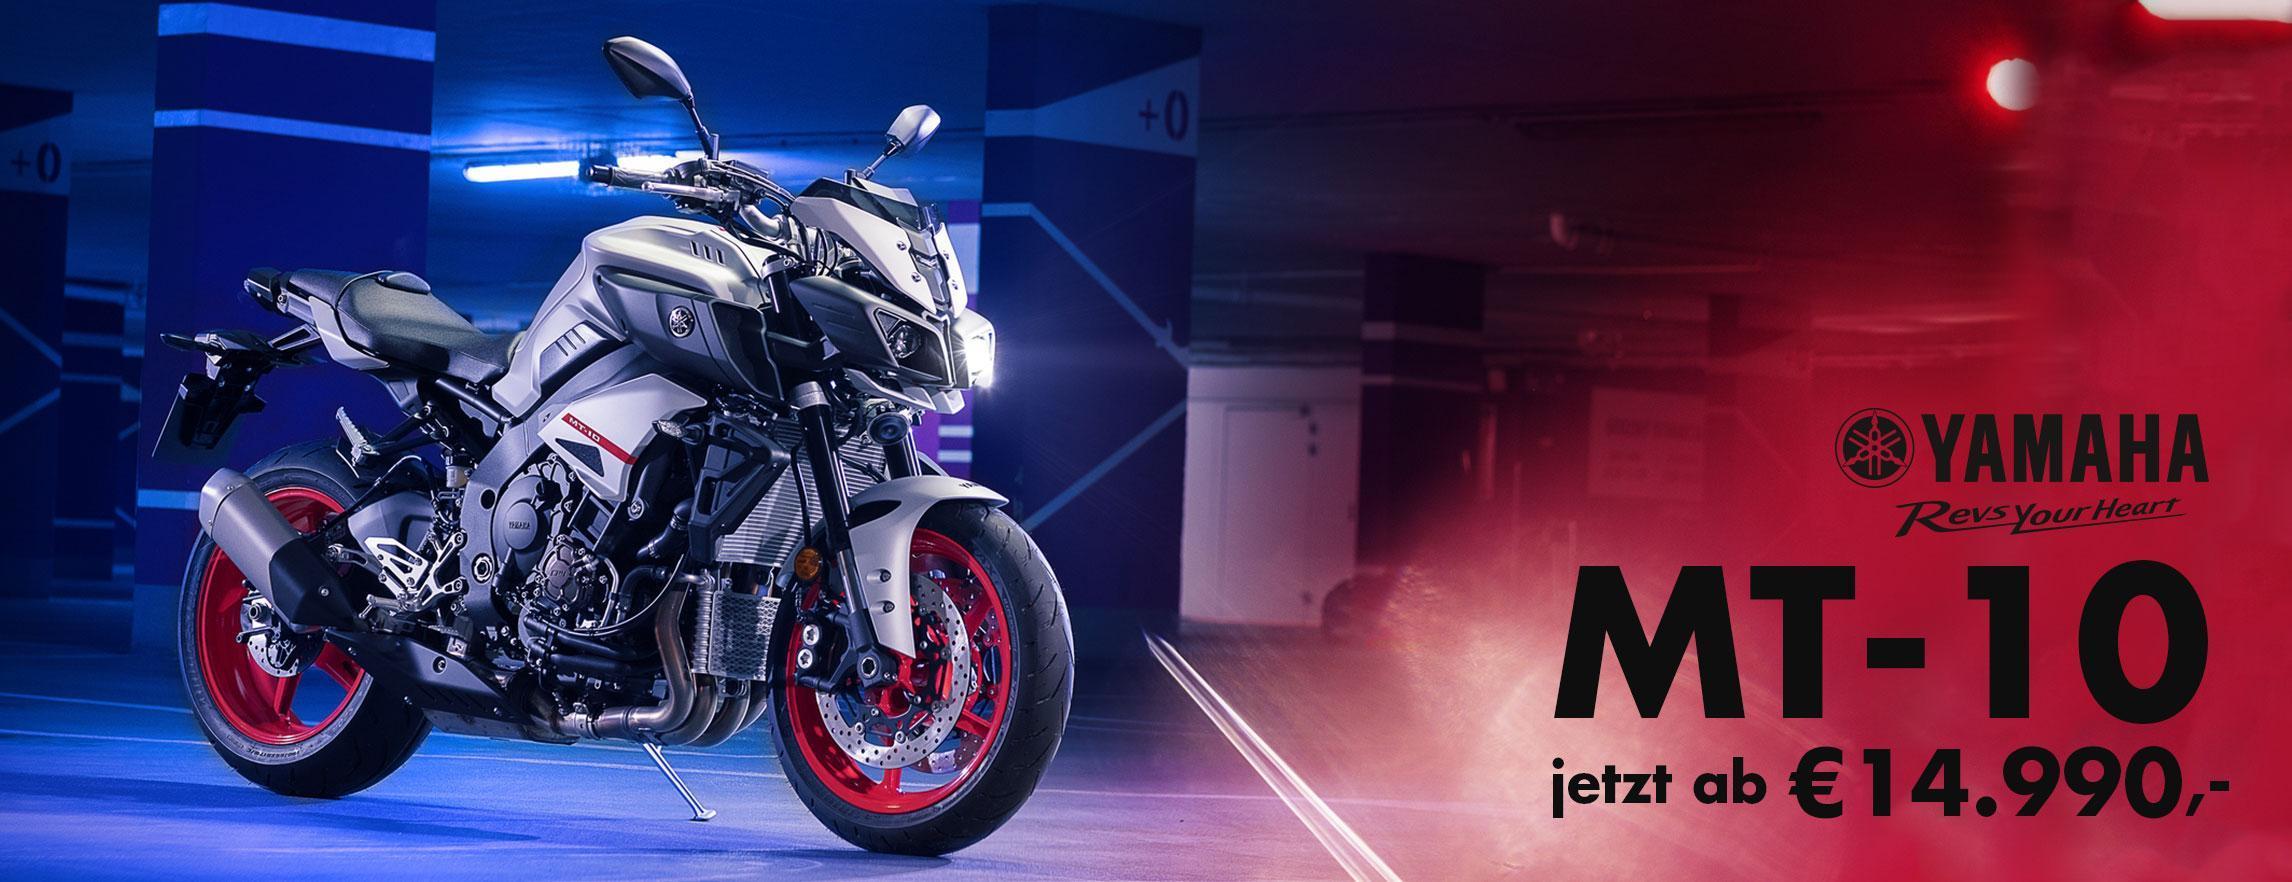 Yamaha MT-10 Aktion SP und Tourer